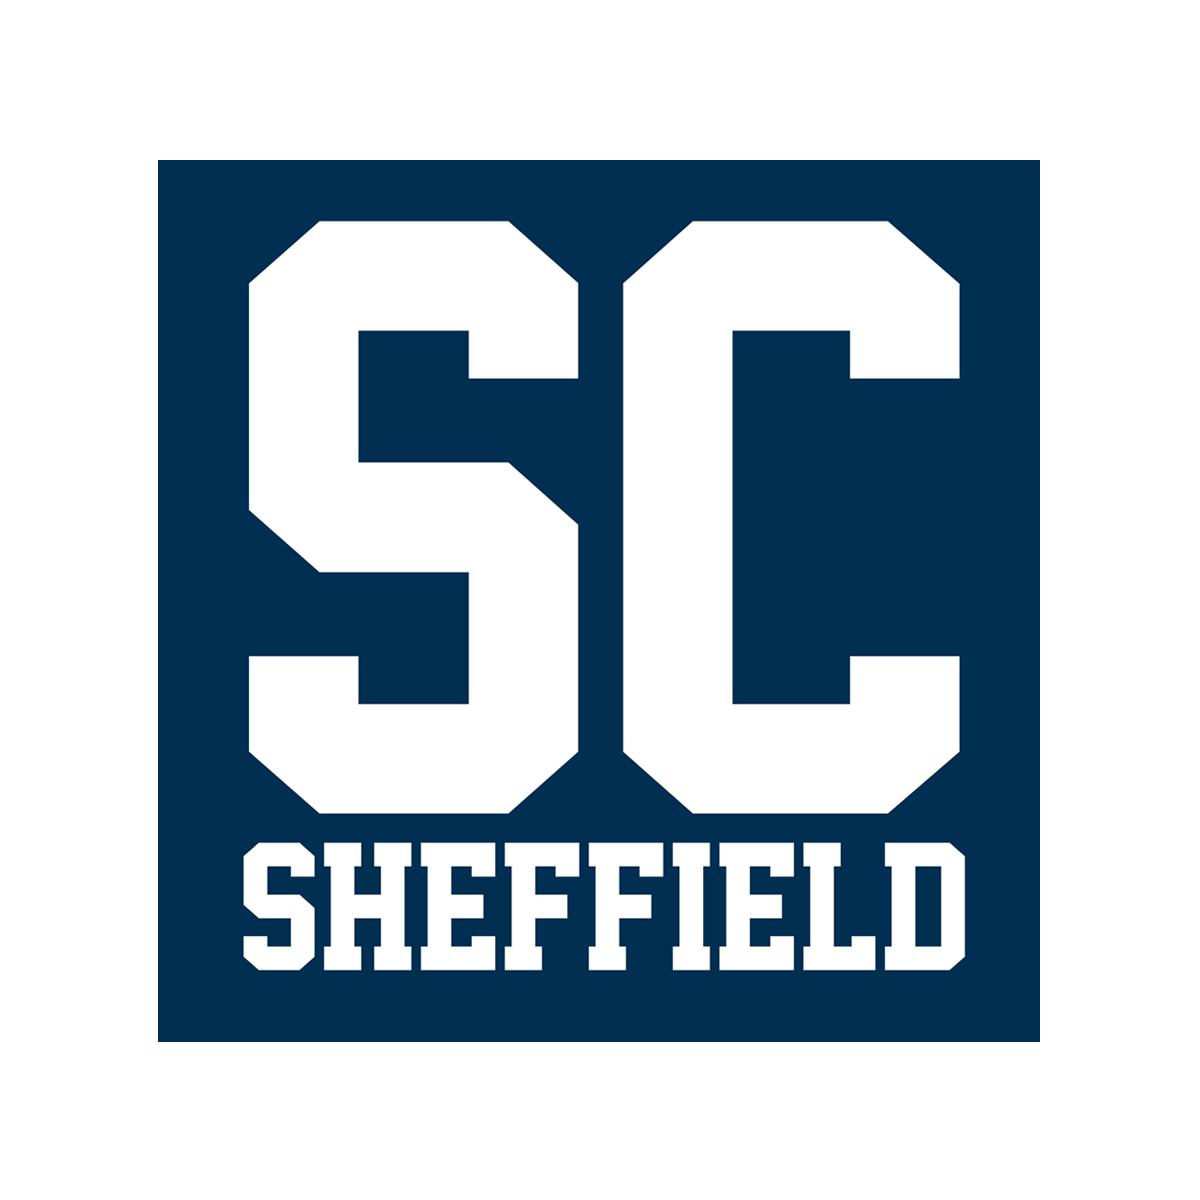 SC Sheffield